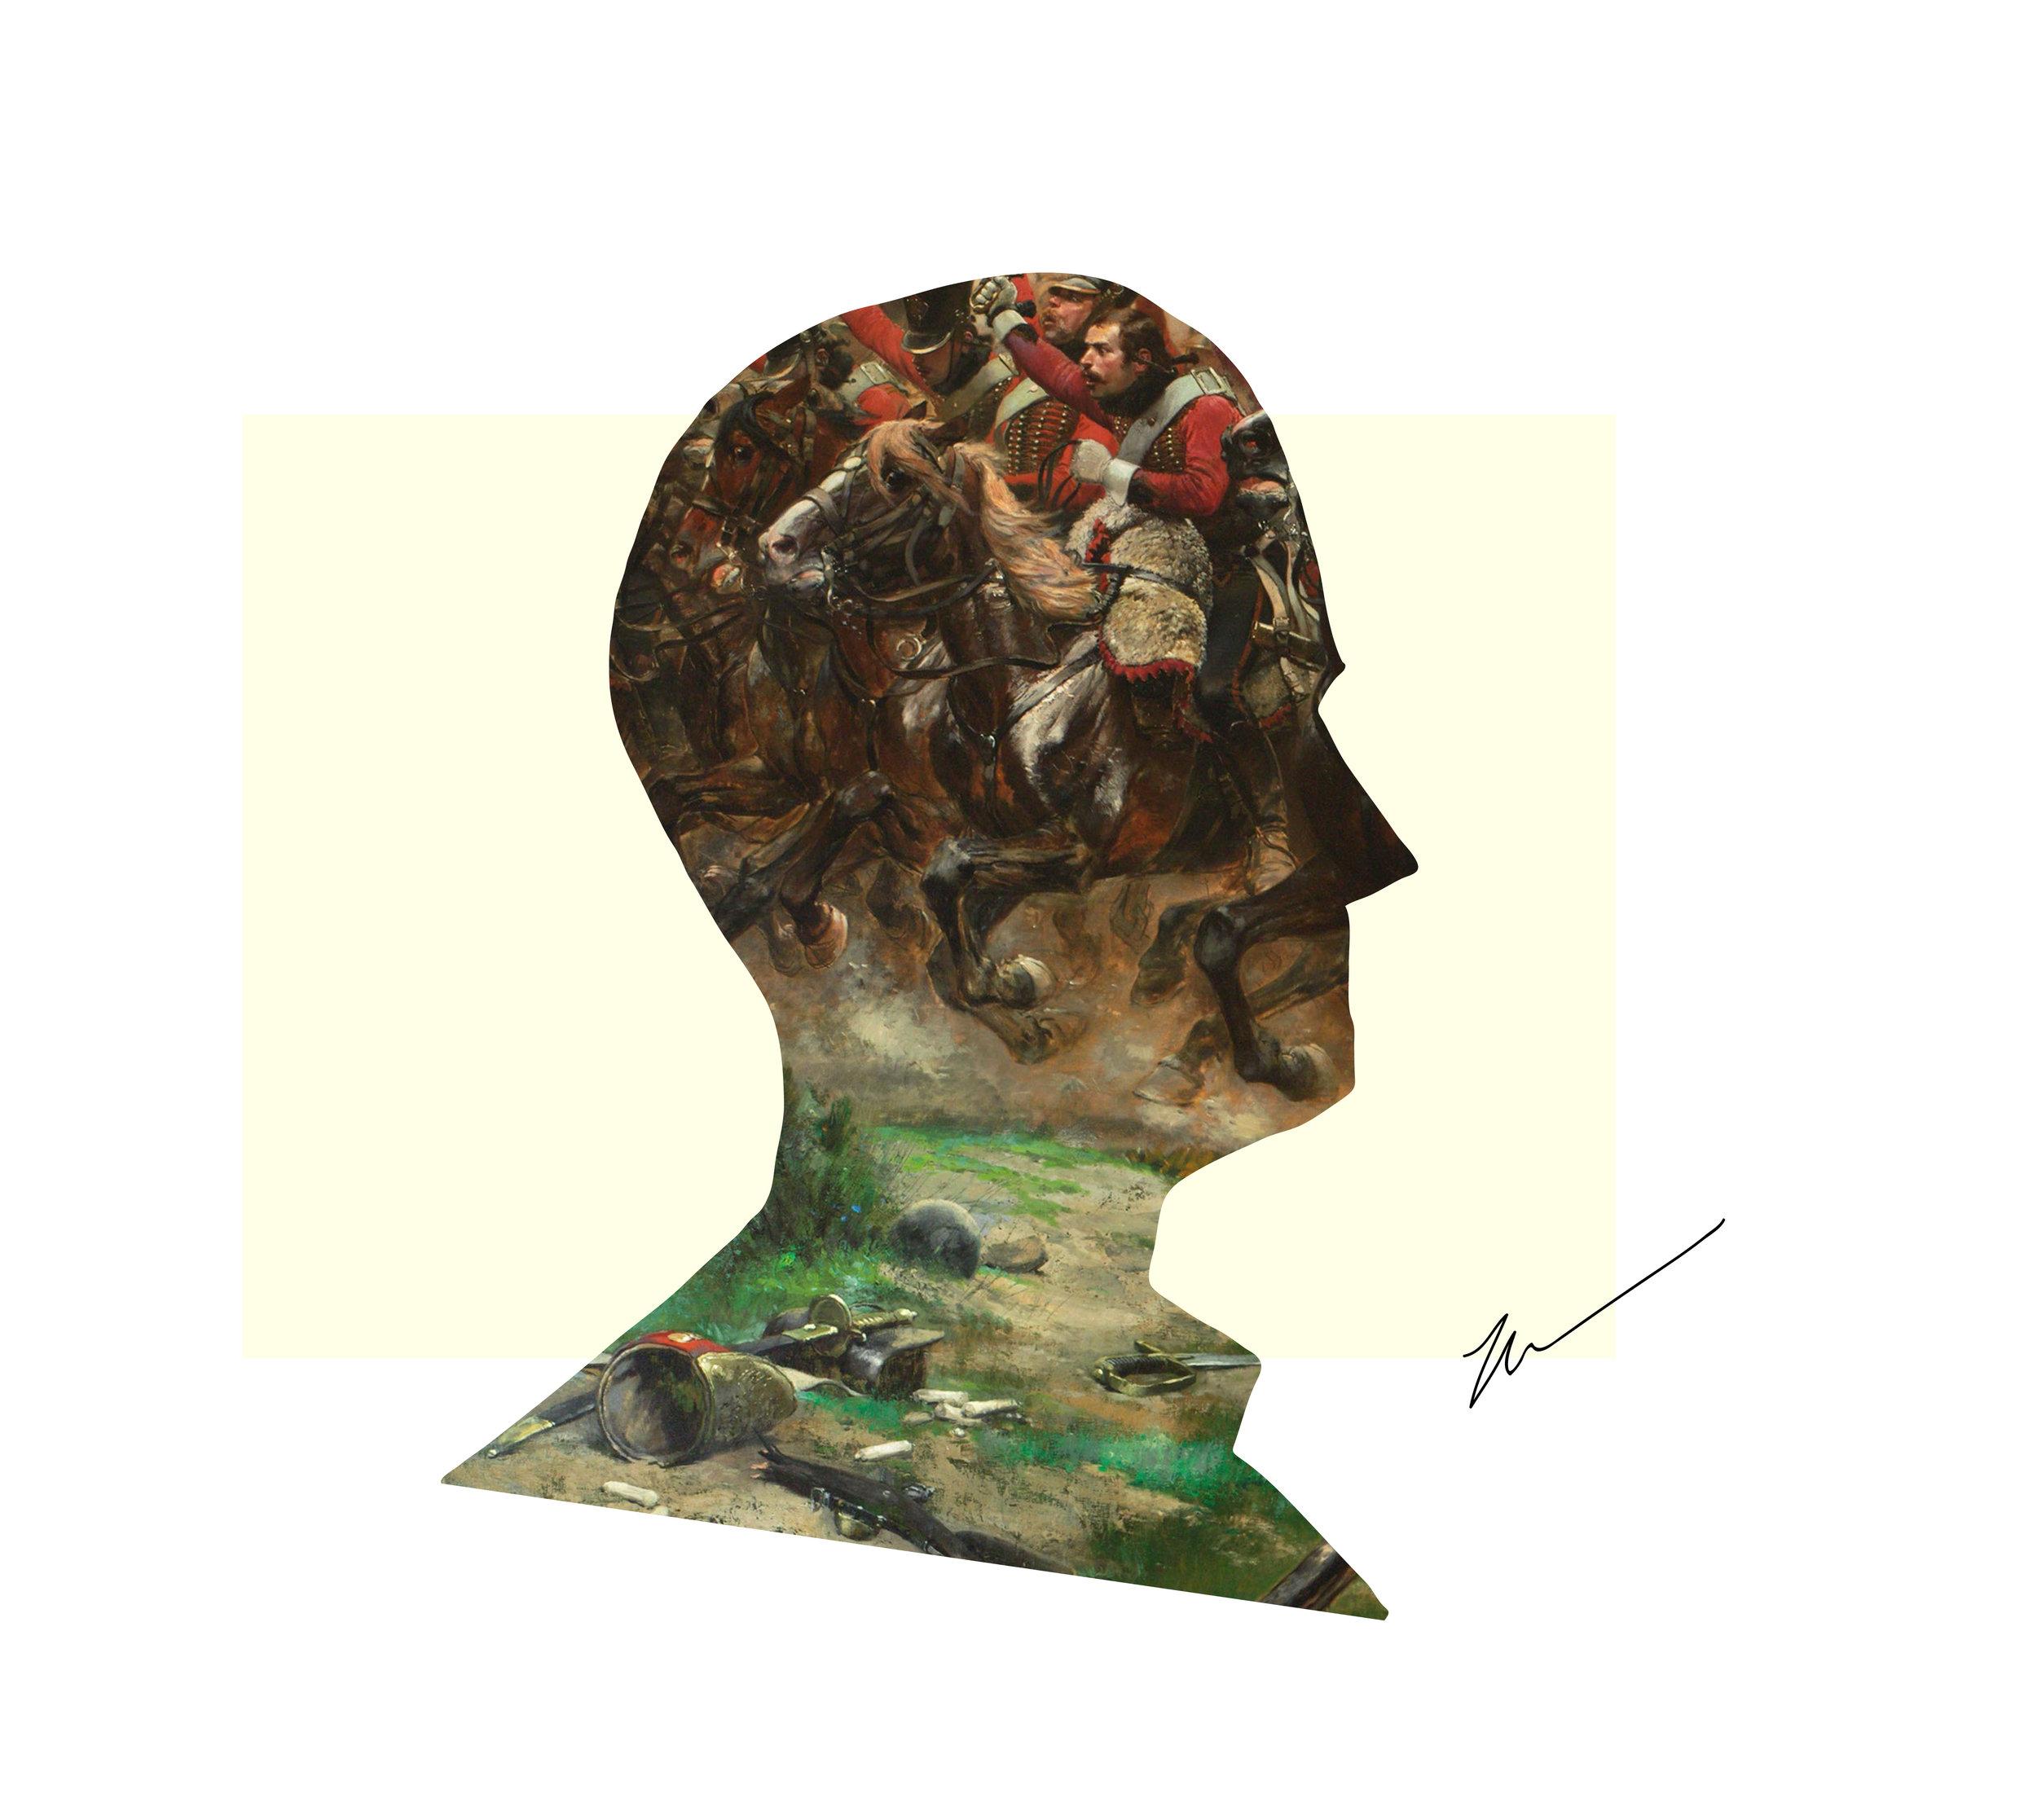 Illustration by Mohnish Soundararajan  (that's me) . Painting:  Vive L'Empereur!  by Édouard Detaille.